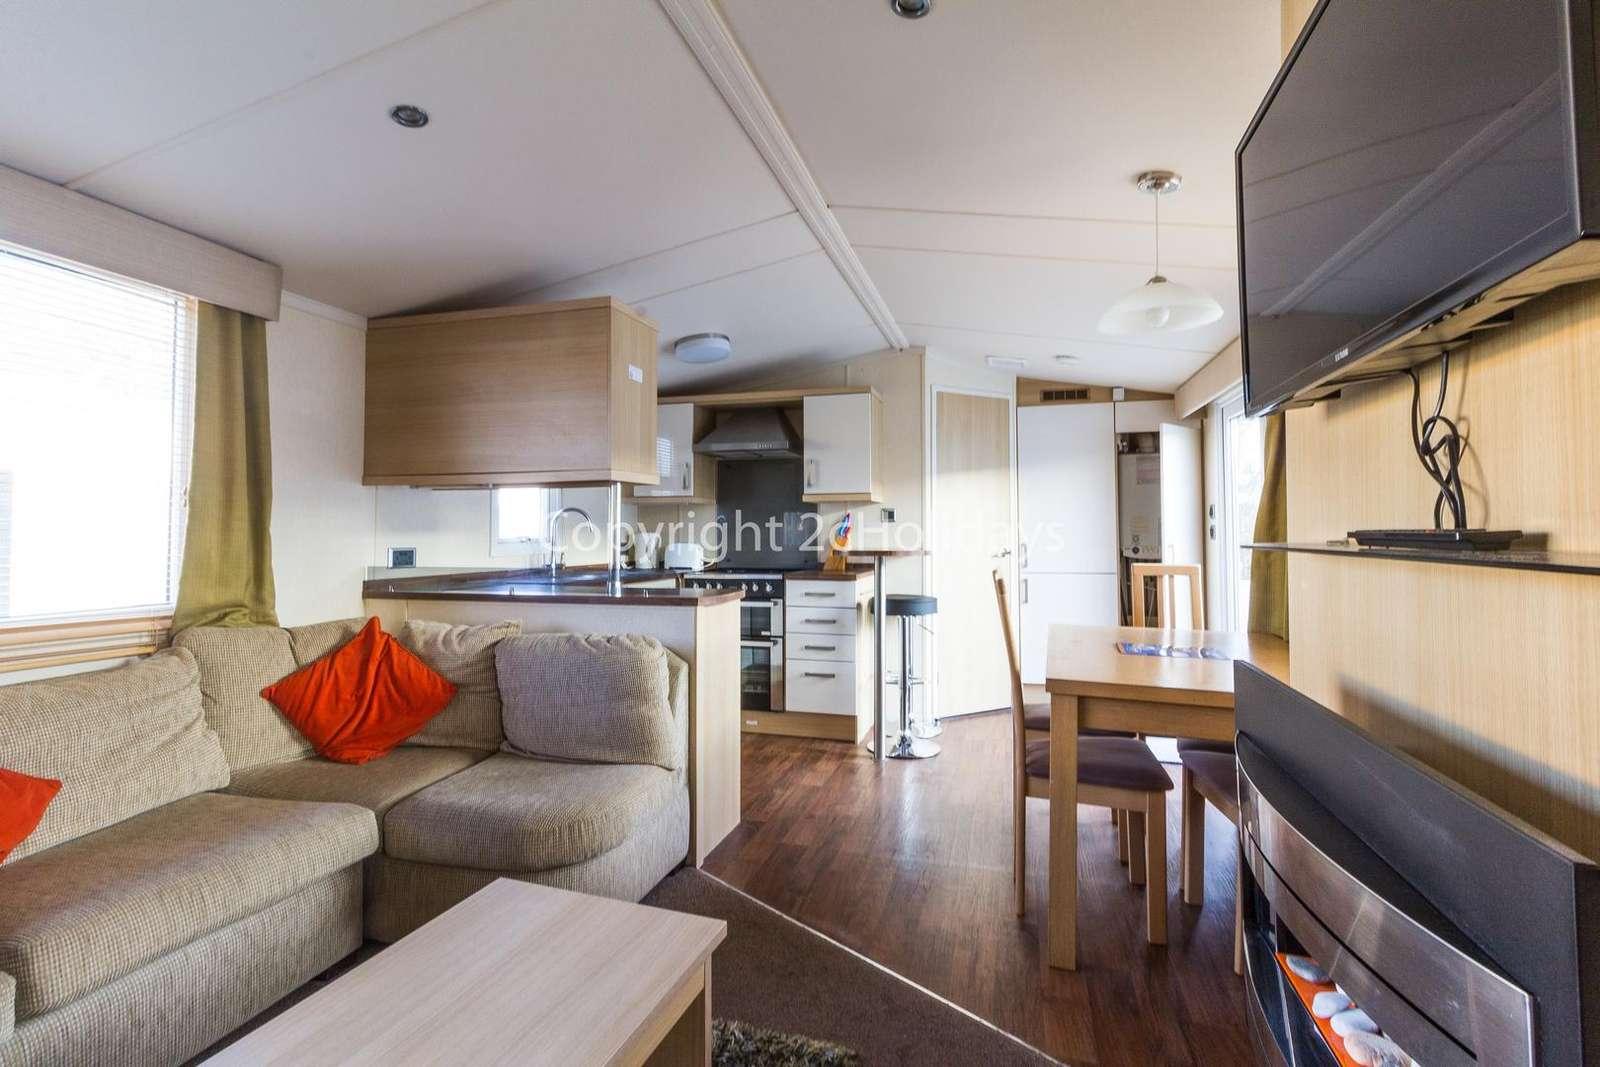 Spacious open plan kitchen/dining area